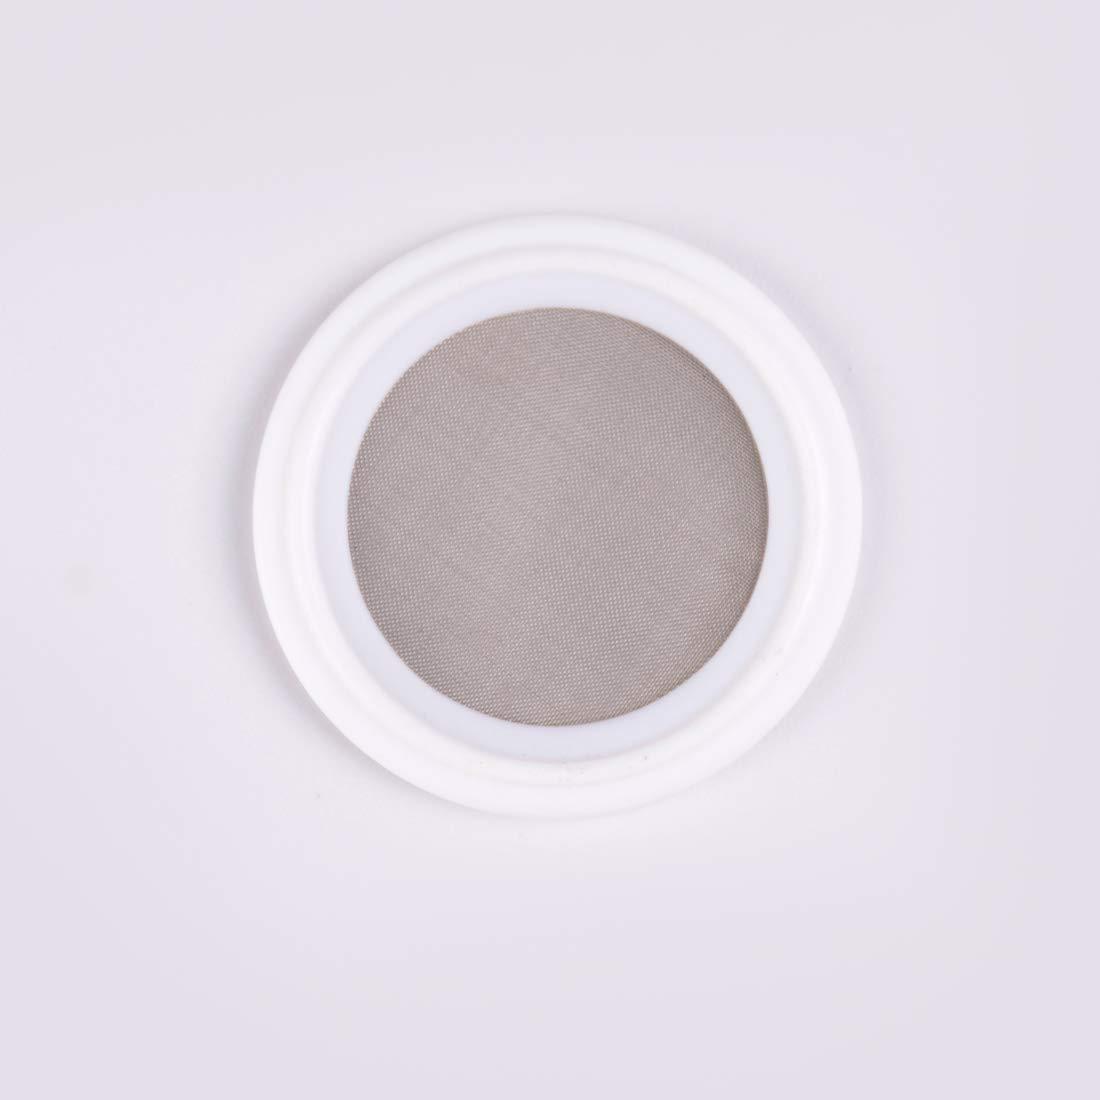 2 150 Mesh PTFE Sanitary Tri-clamp Screen Gasket Pharmaceutical Grade Filter Mesh.